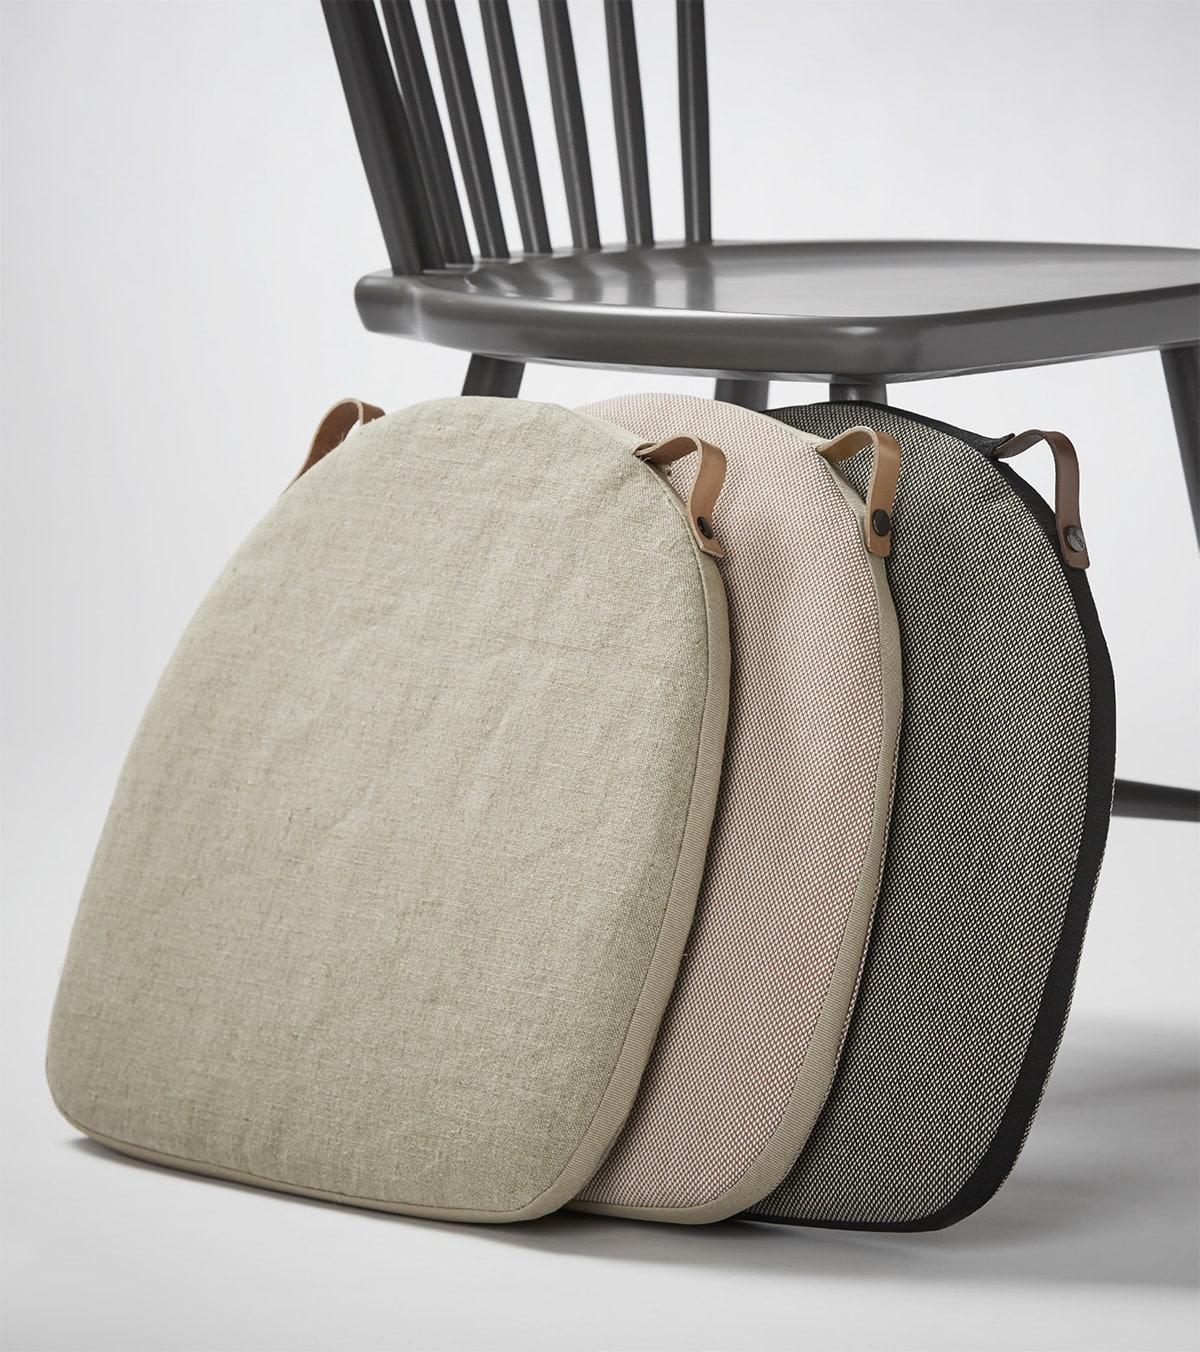 Seat cushion - Stolab